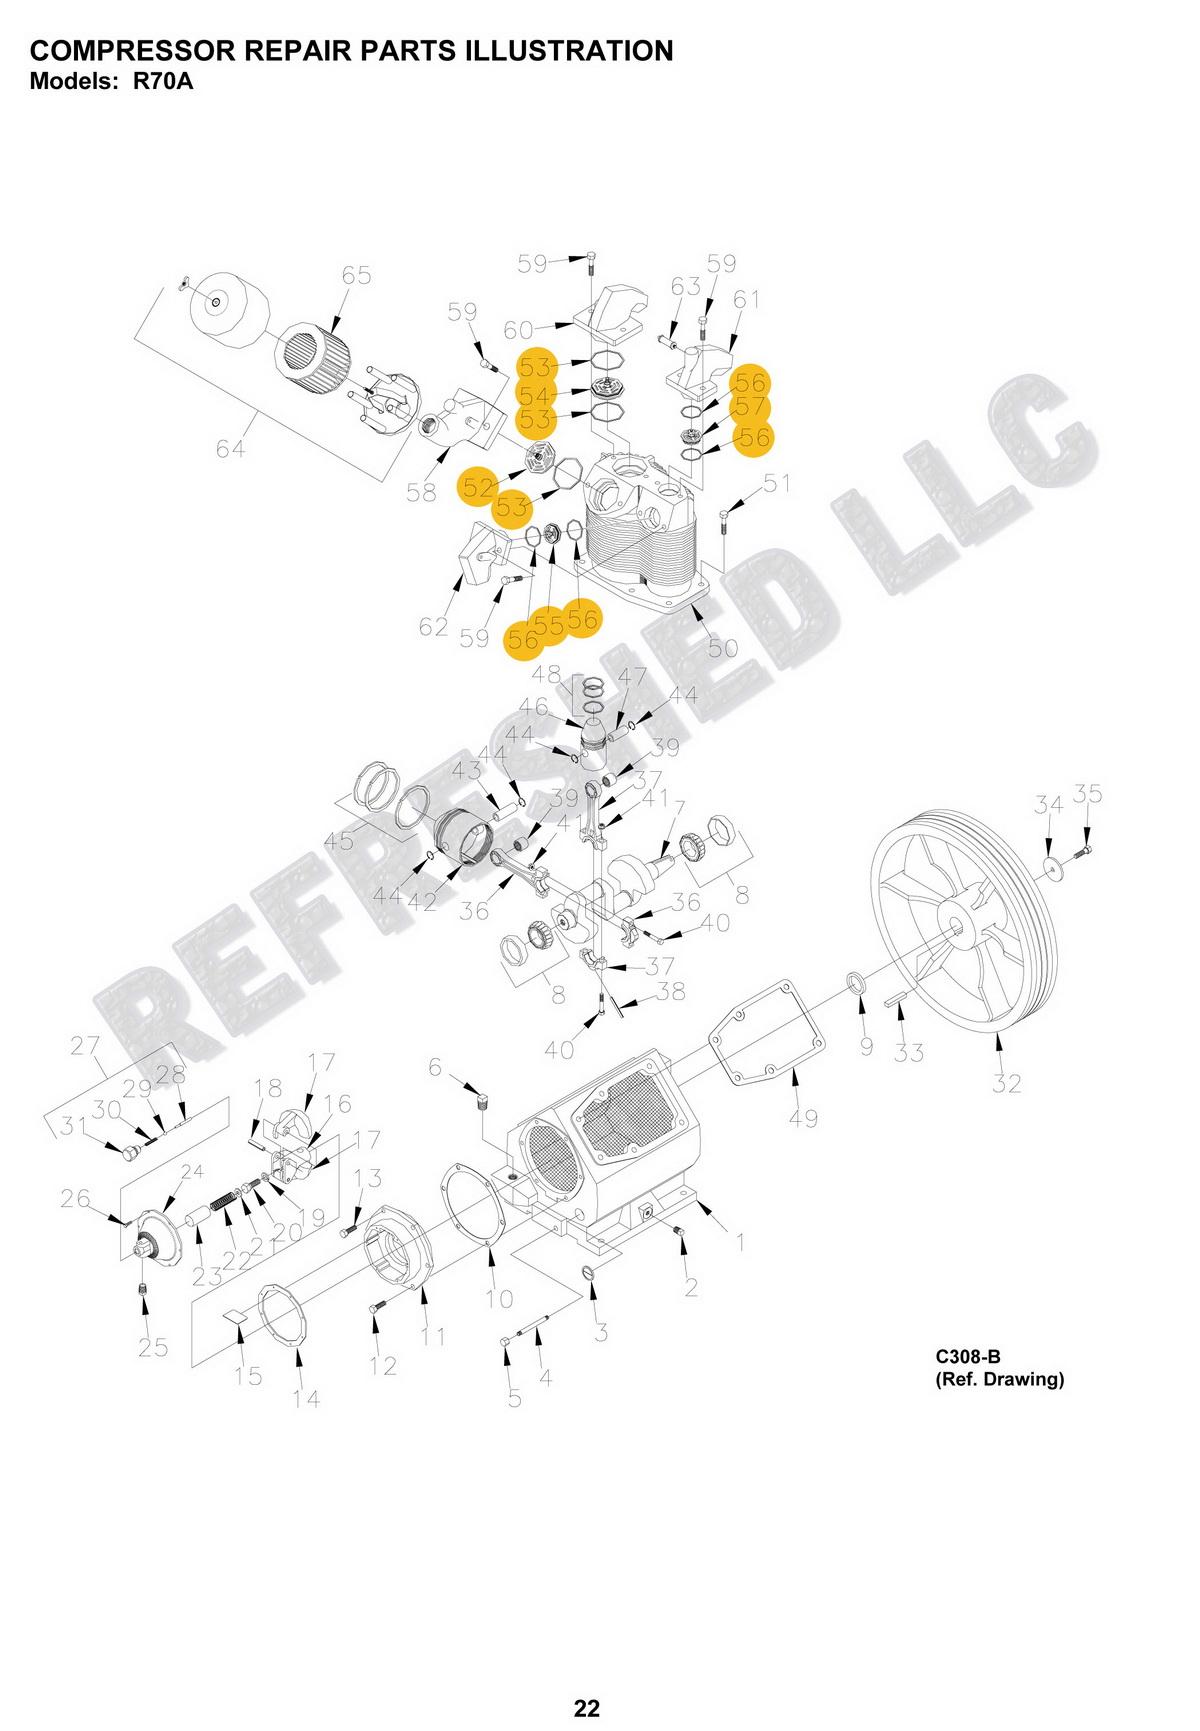 Champion GD Valve Kit Air Compressor Parts Z614 Vshok R70